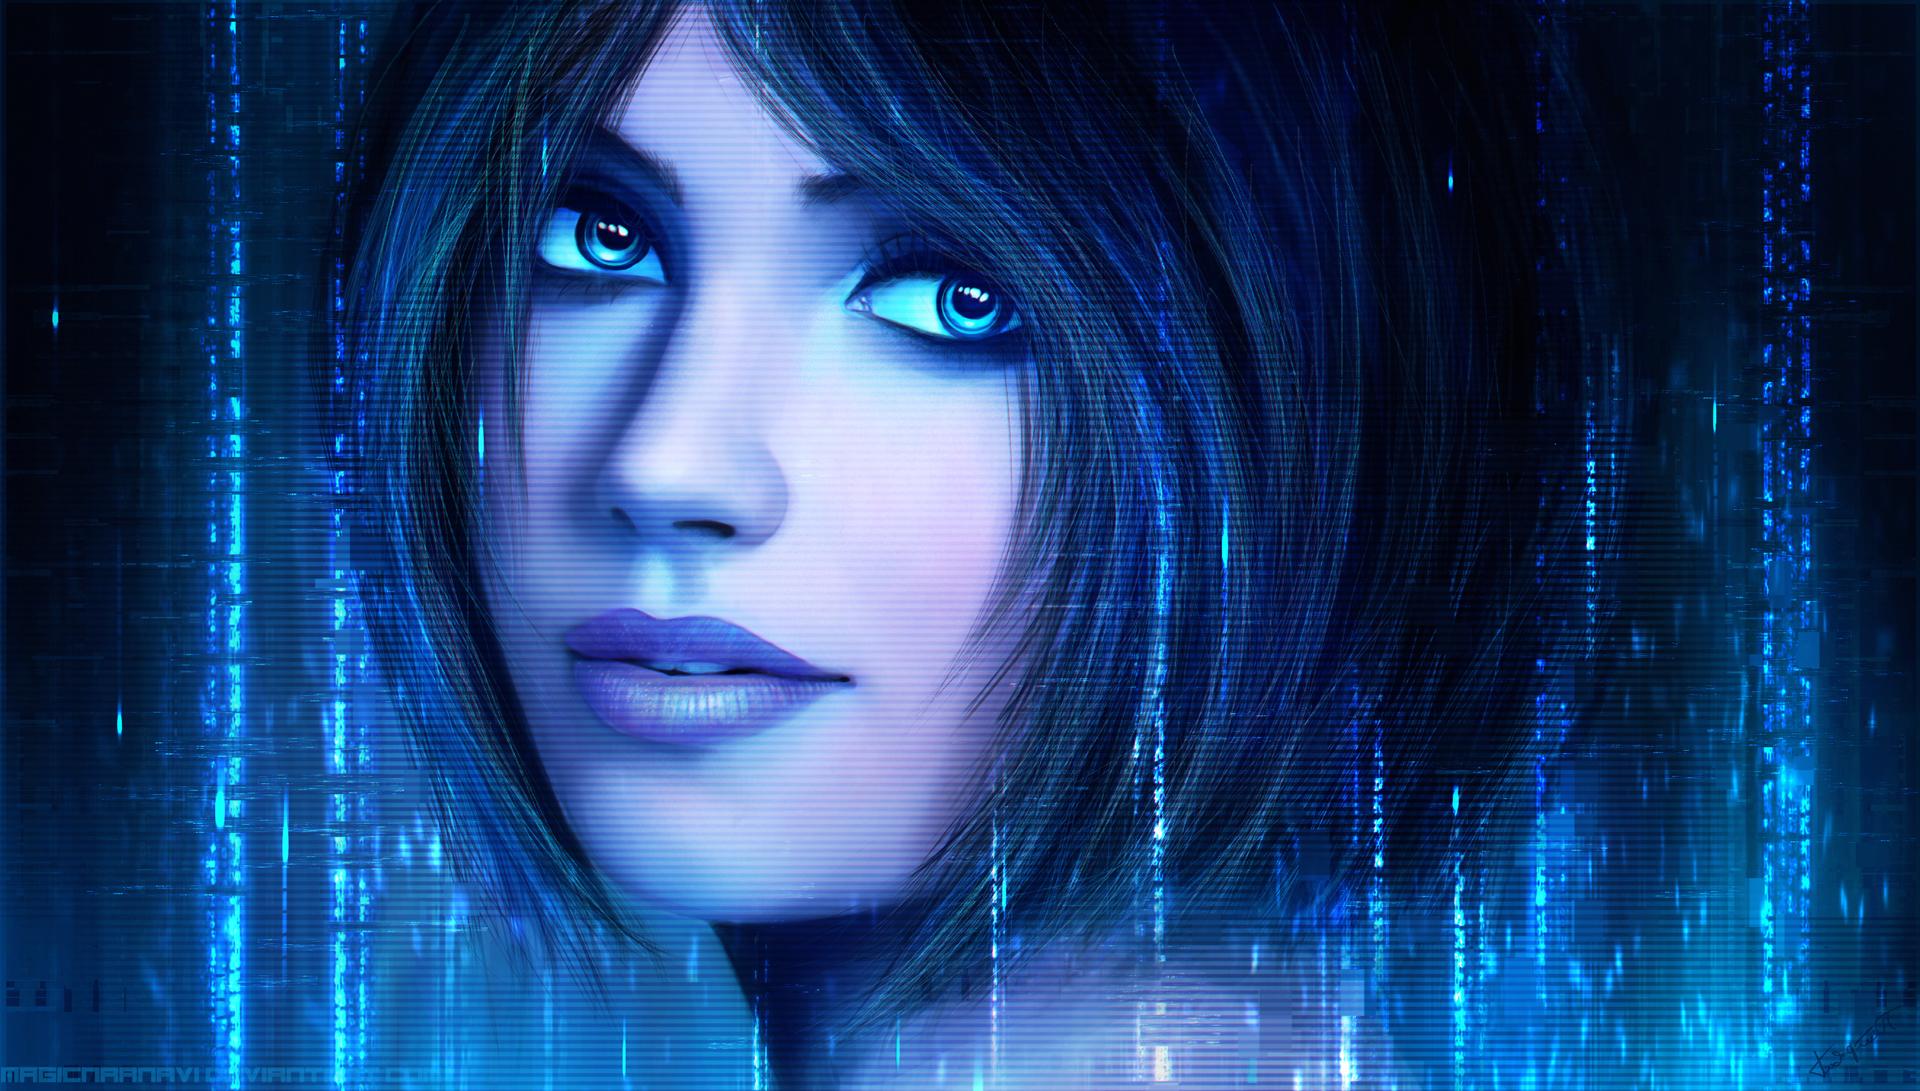 Cortana by magicnaanavi on deviantart